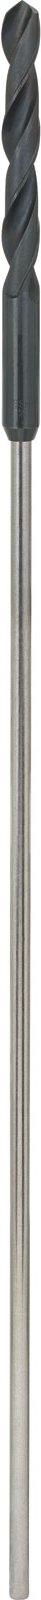 Bosch Extra Length Formwork and Installation Drill 14mm 600mm